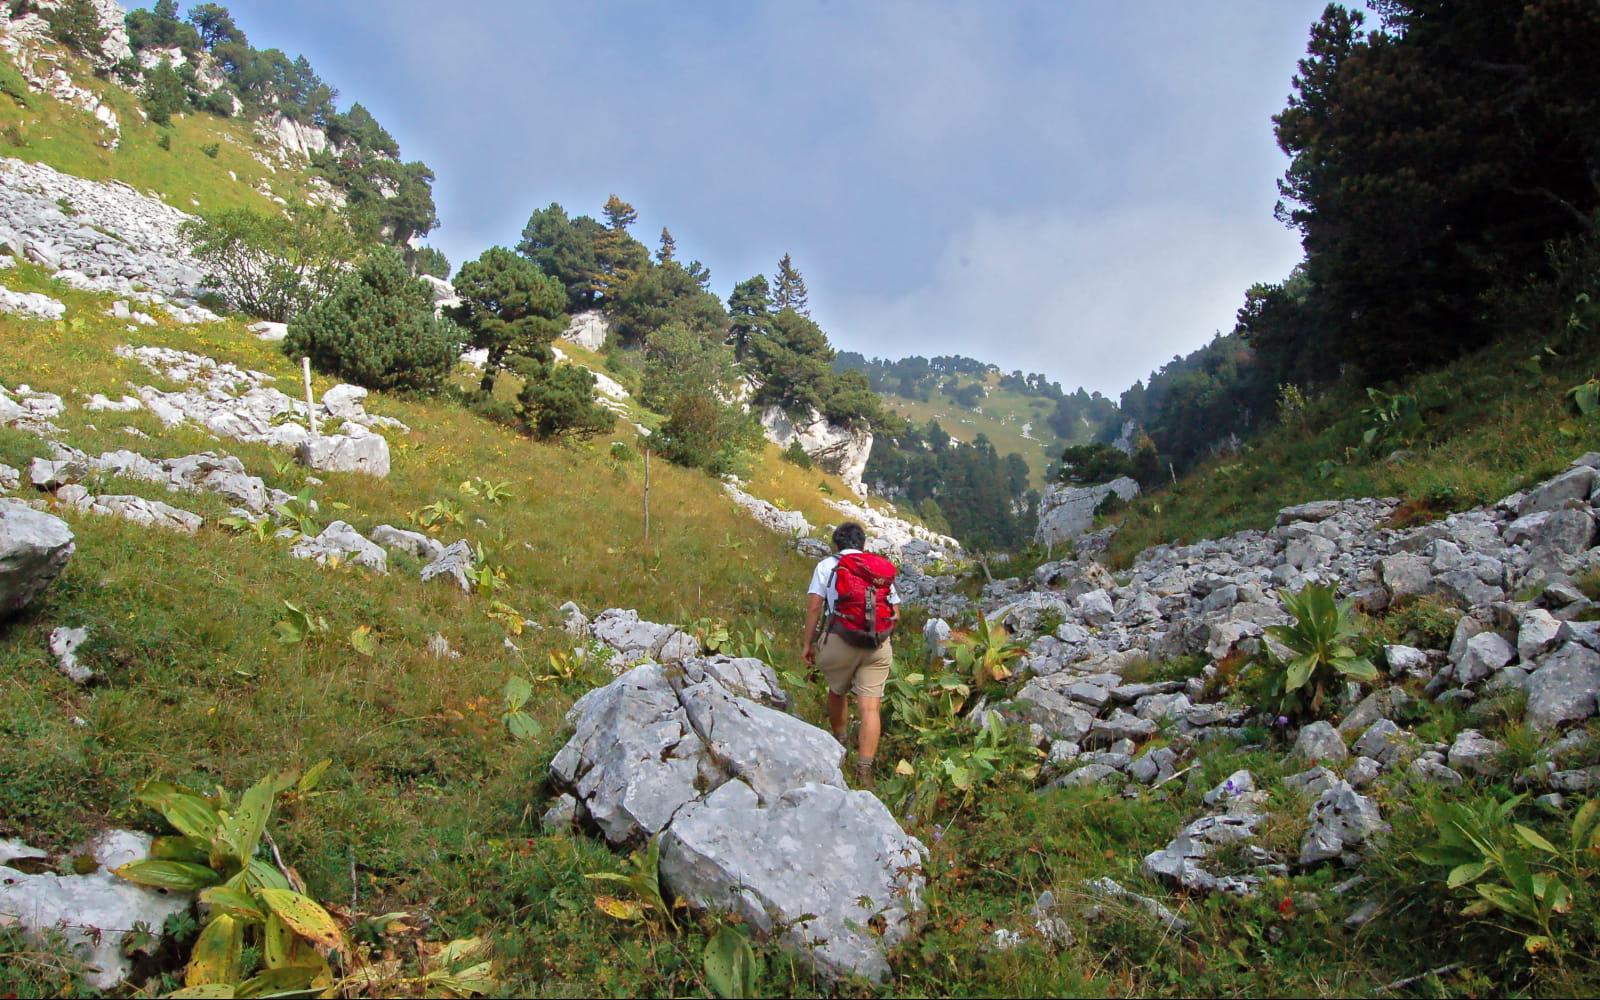 Rando sur les crètes du massif du Jura